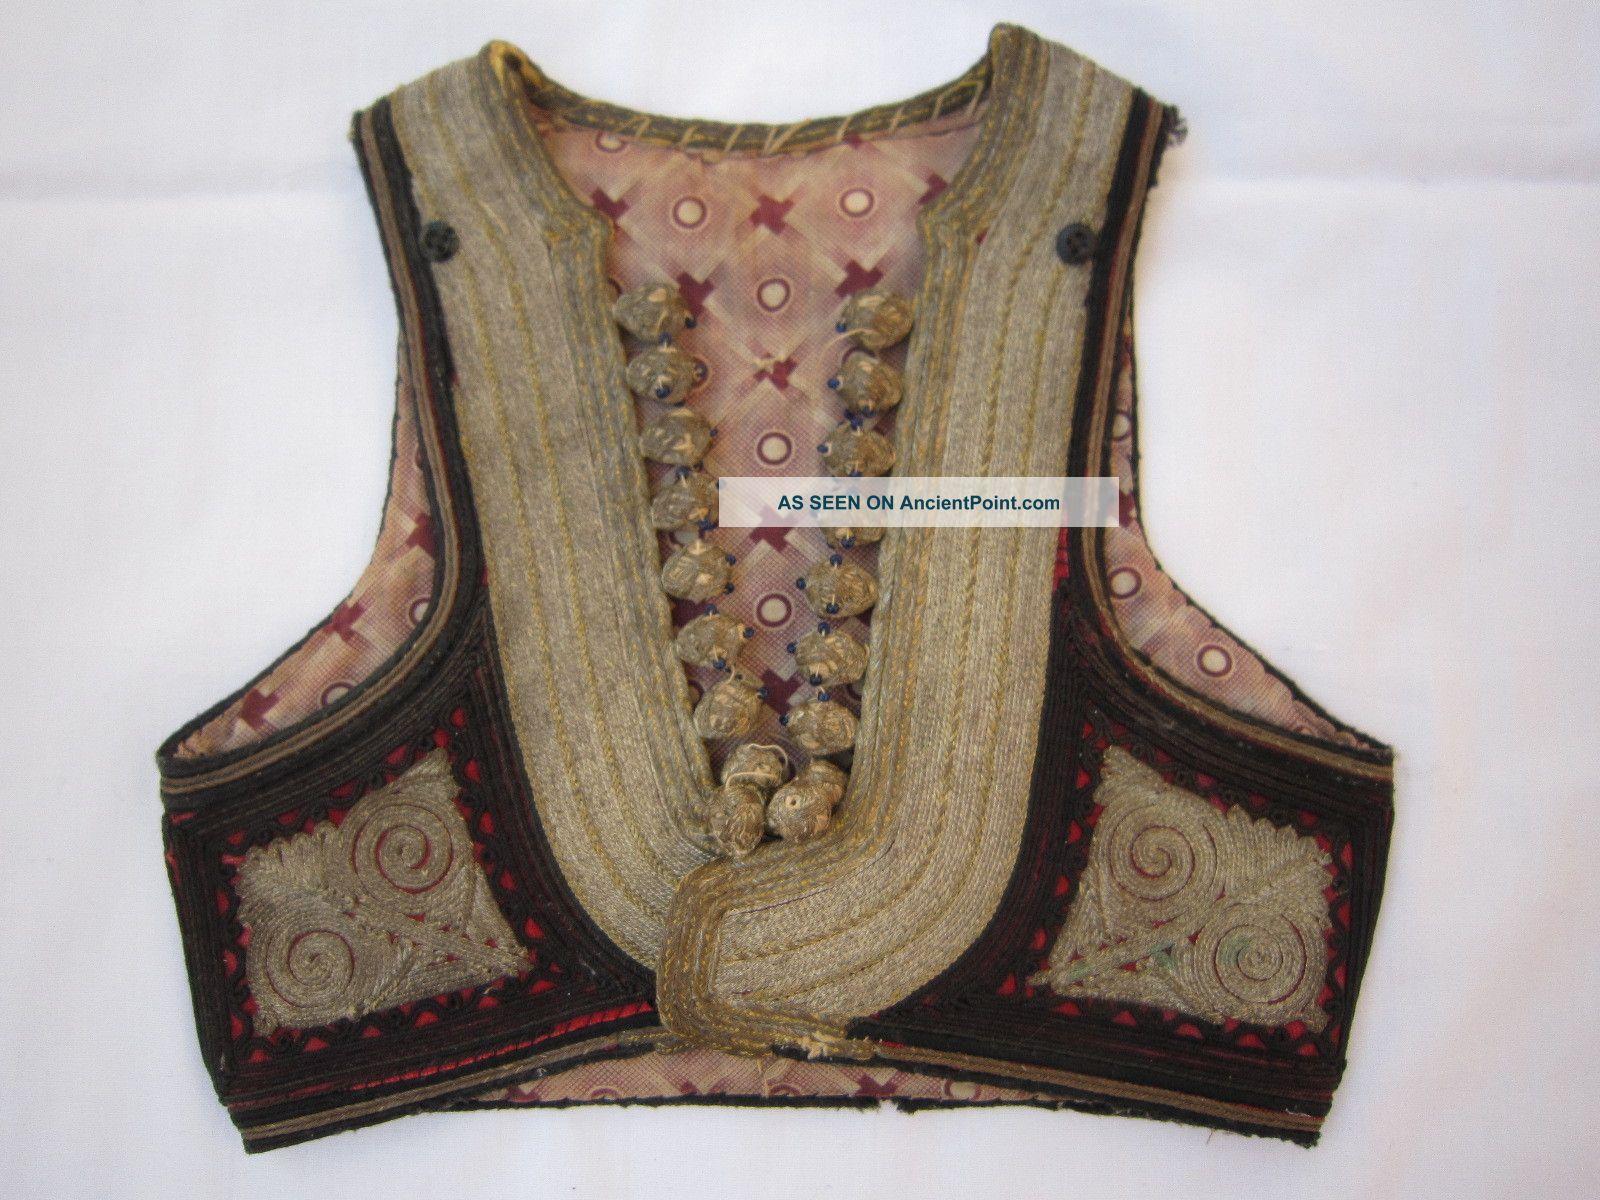 Gorgeous Antique Ottoman Sleeveless Jacket,  Vest 18c. ,  Very Rare,  Sarma Islamic photo